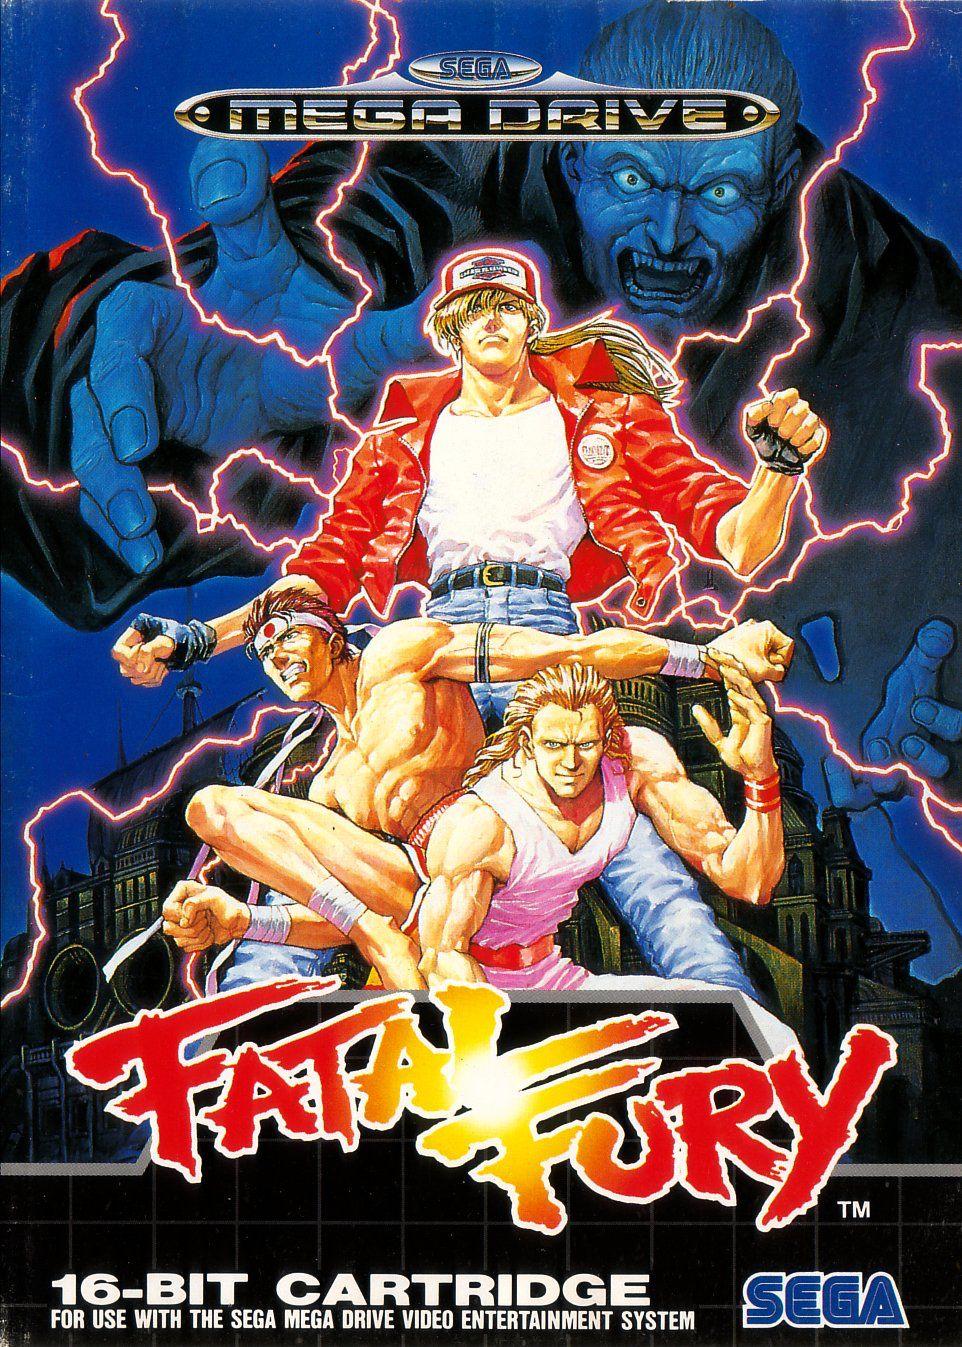 Fatal Fury Classic Video Games Retro Video Games Sega Games